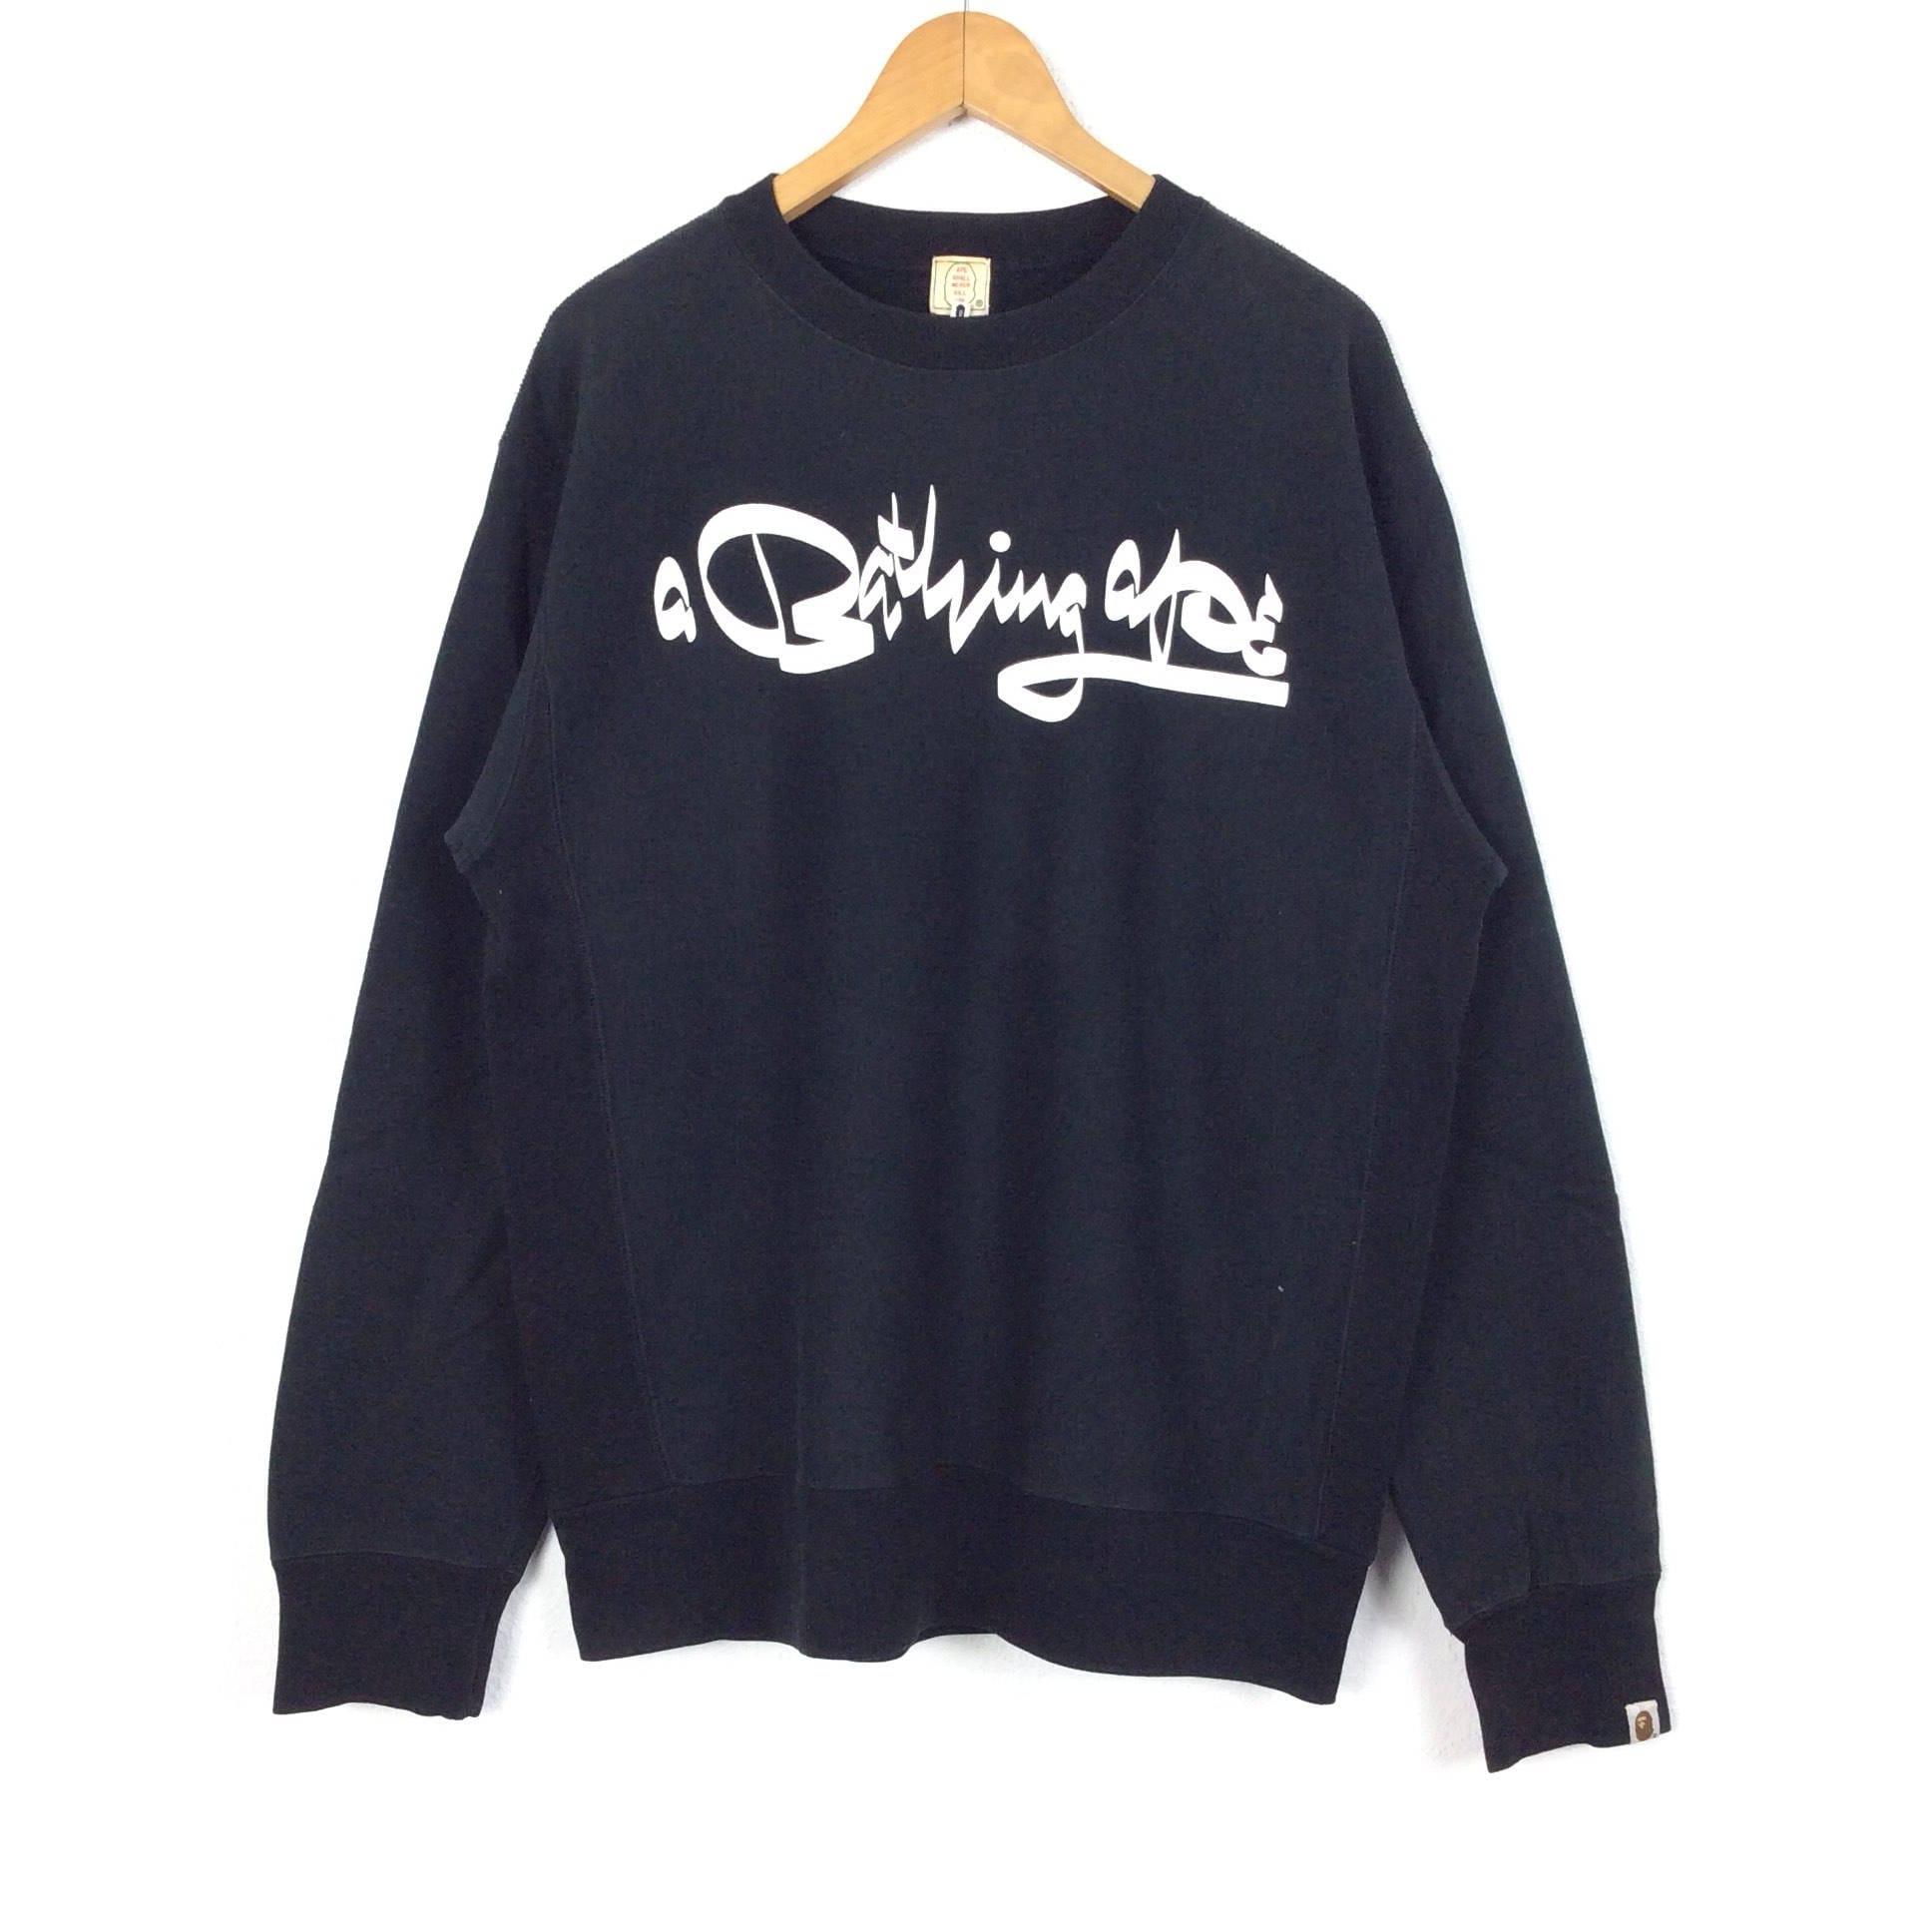 Maillot Gros Japon De Logo Sweatshirt Bain Un Rare Ape Pull AqHOqxwf